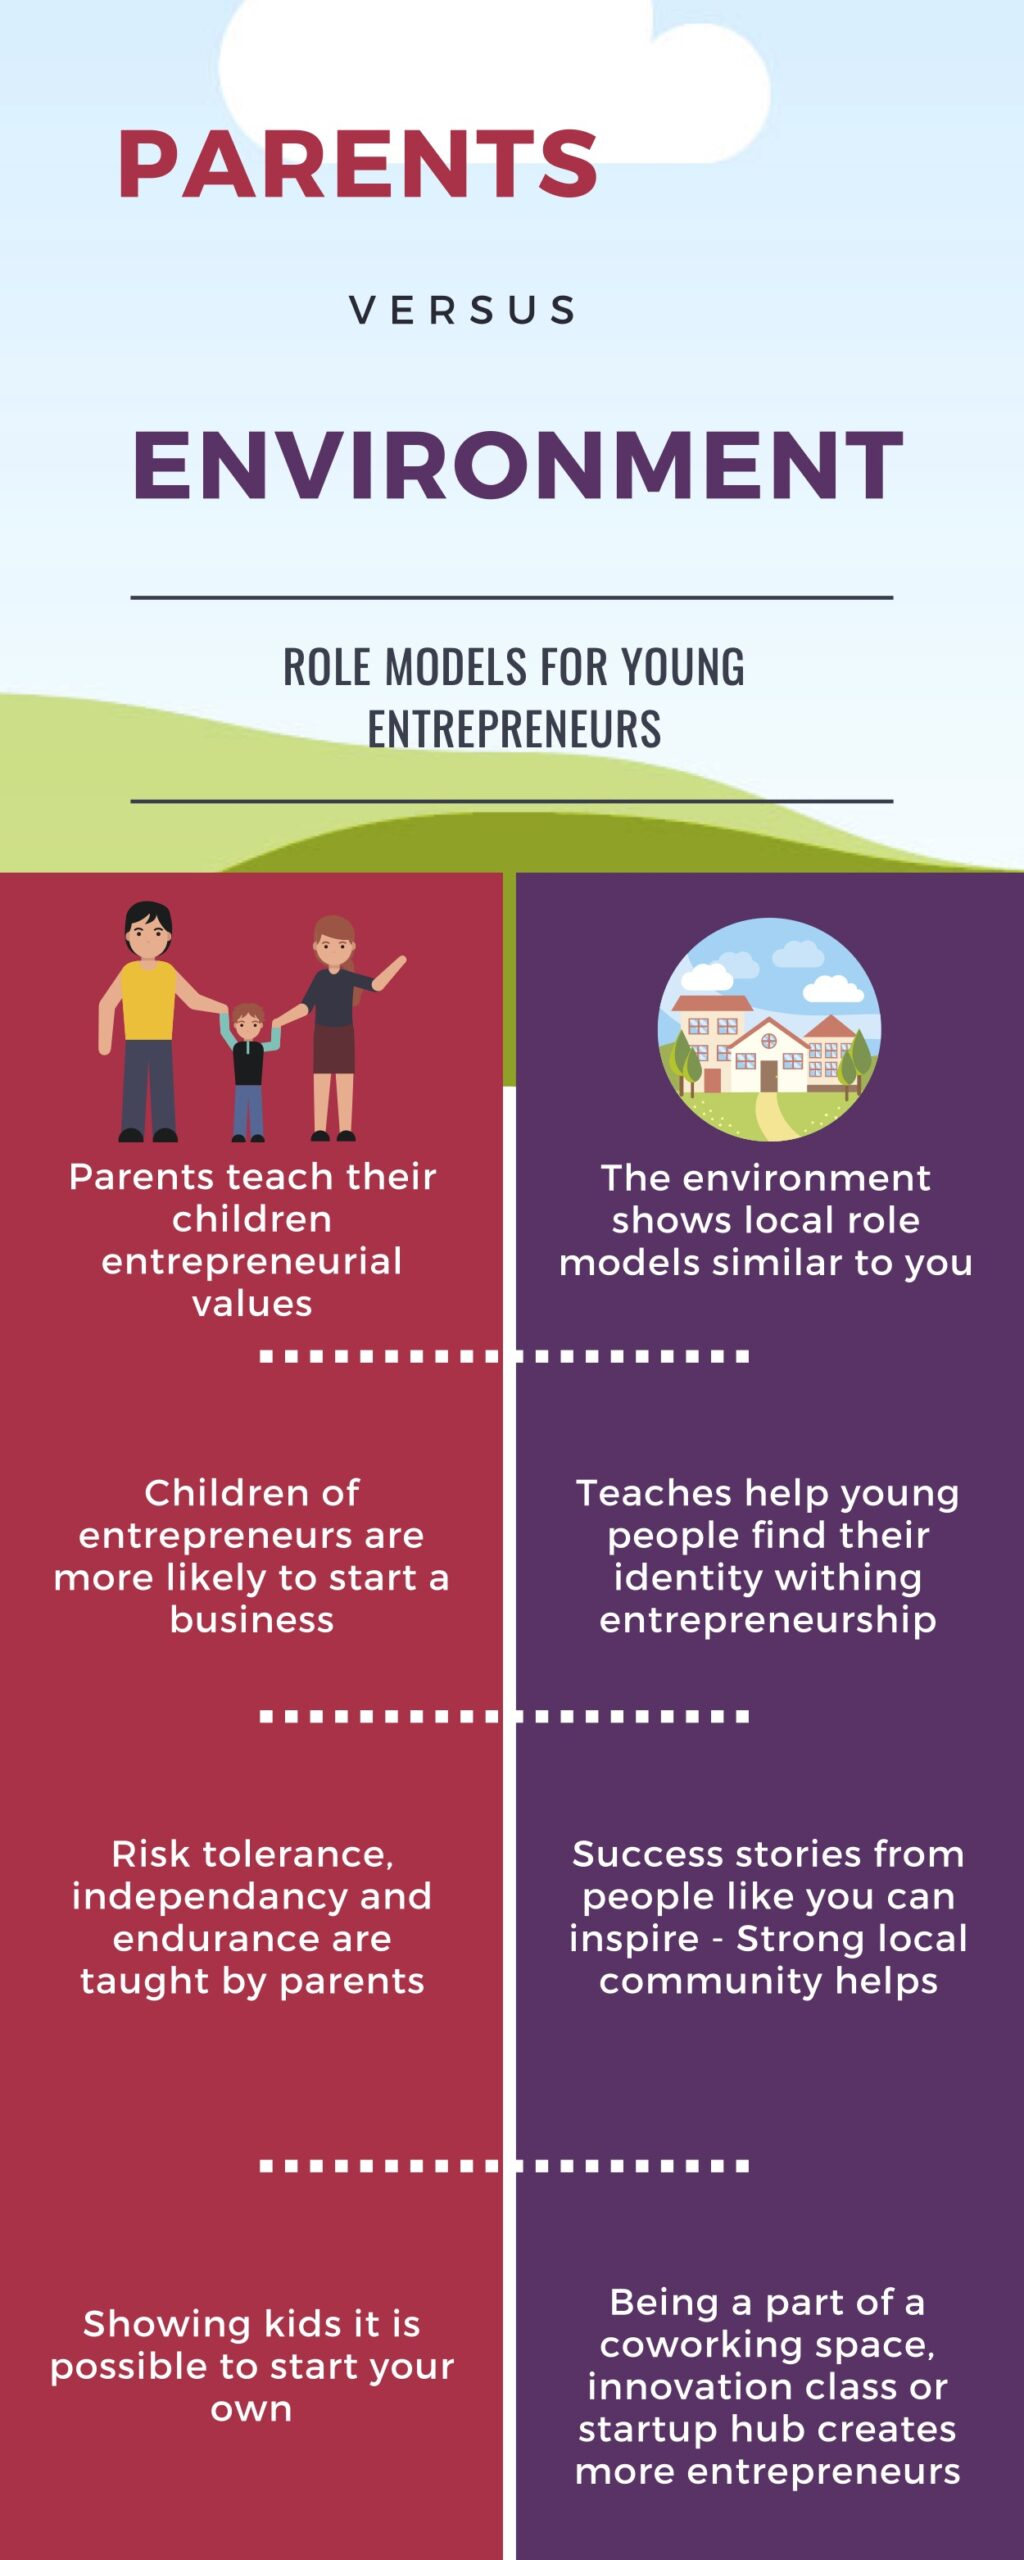 info role models